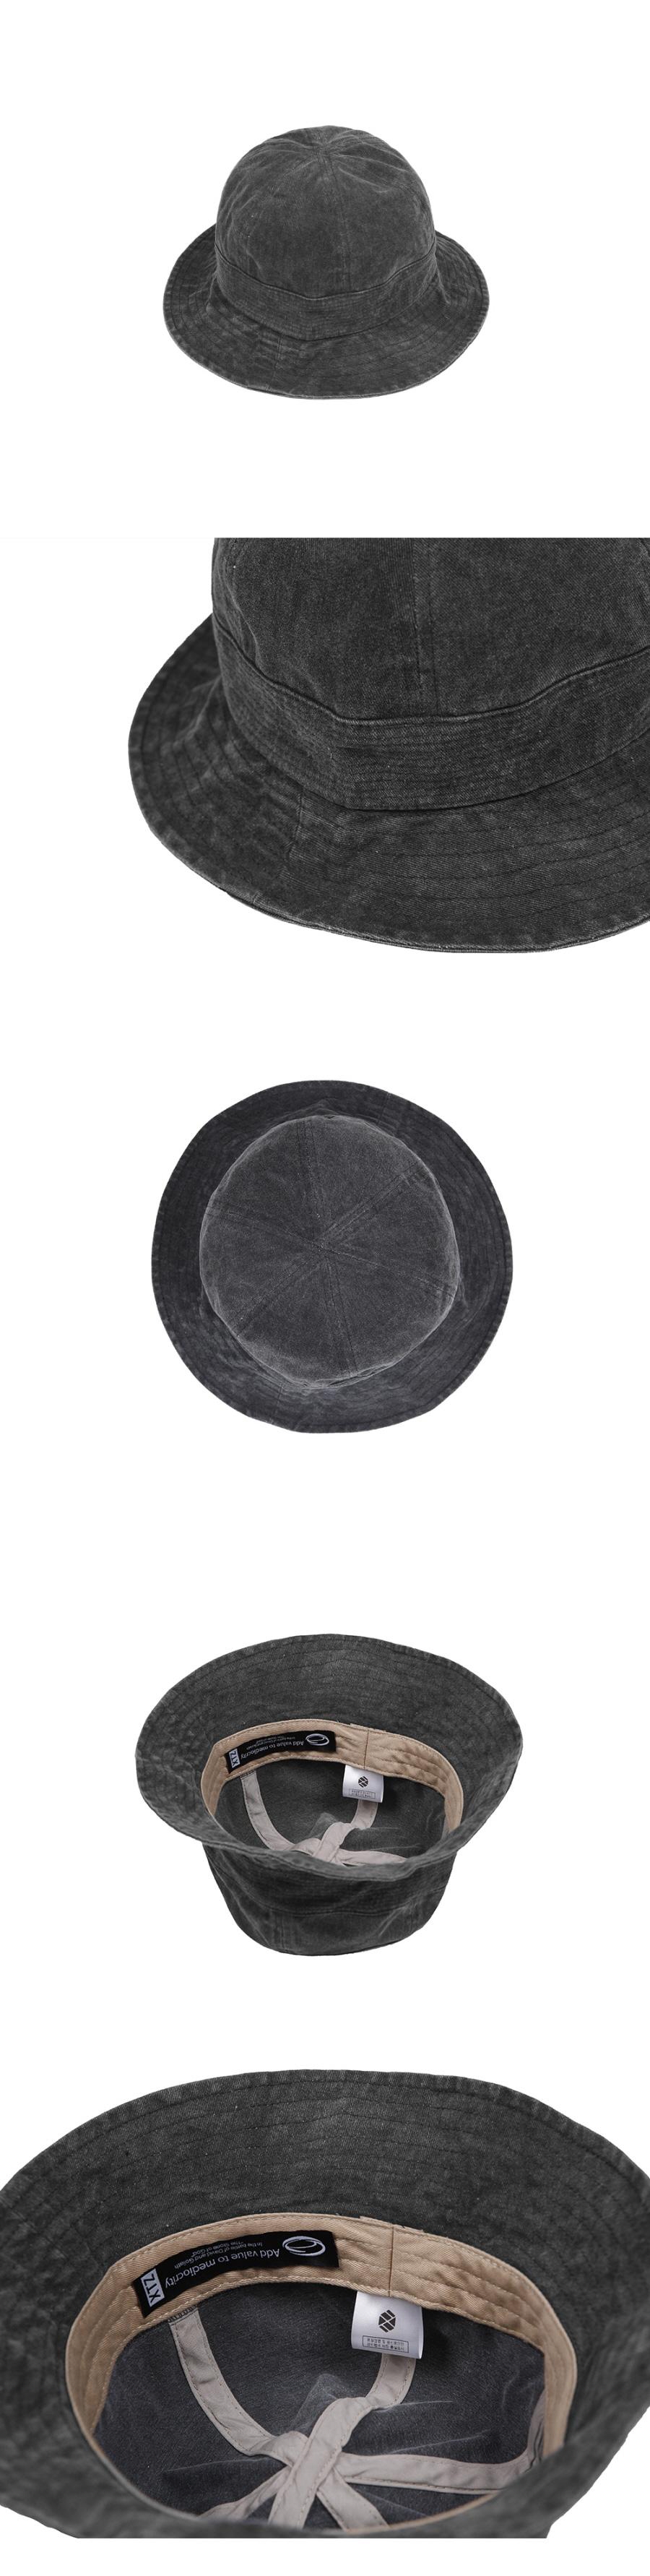 XTC024 피그먼트 버킷햇 (BLACK)